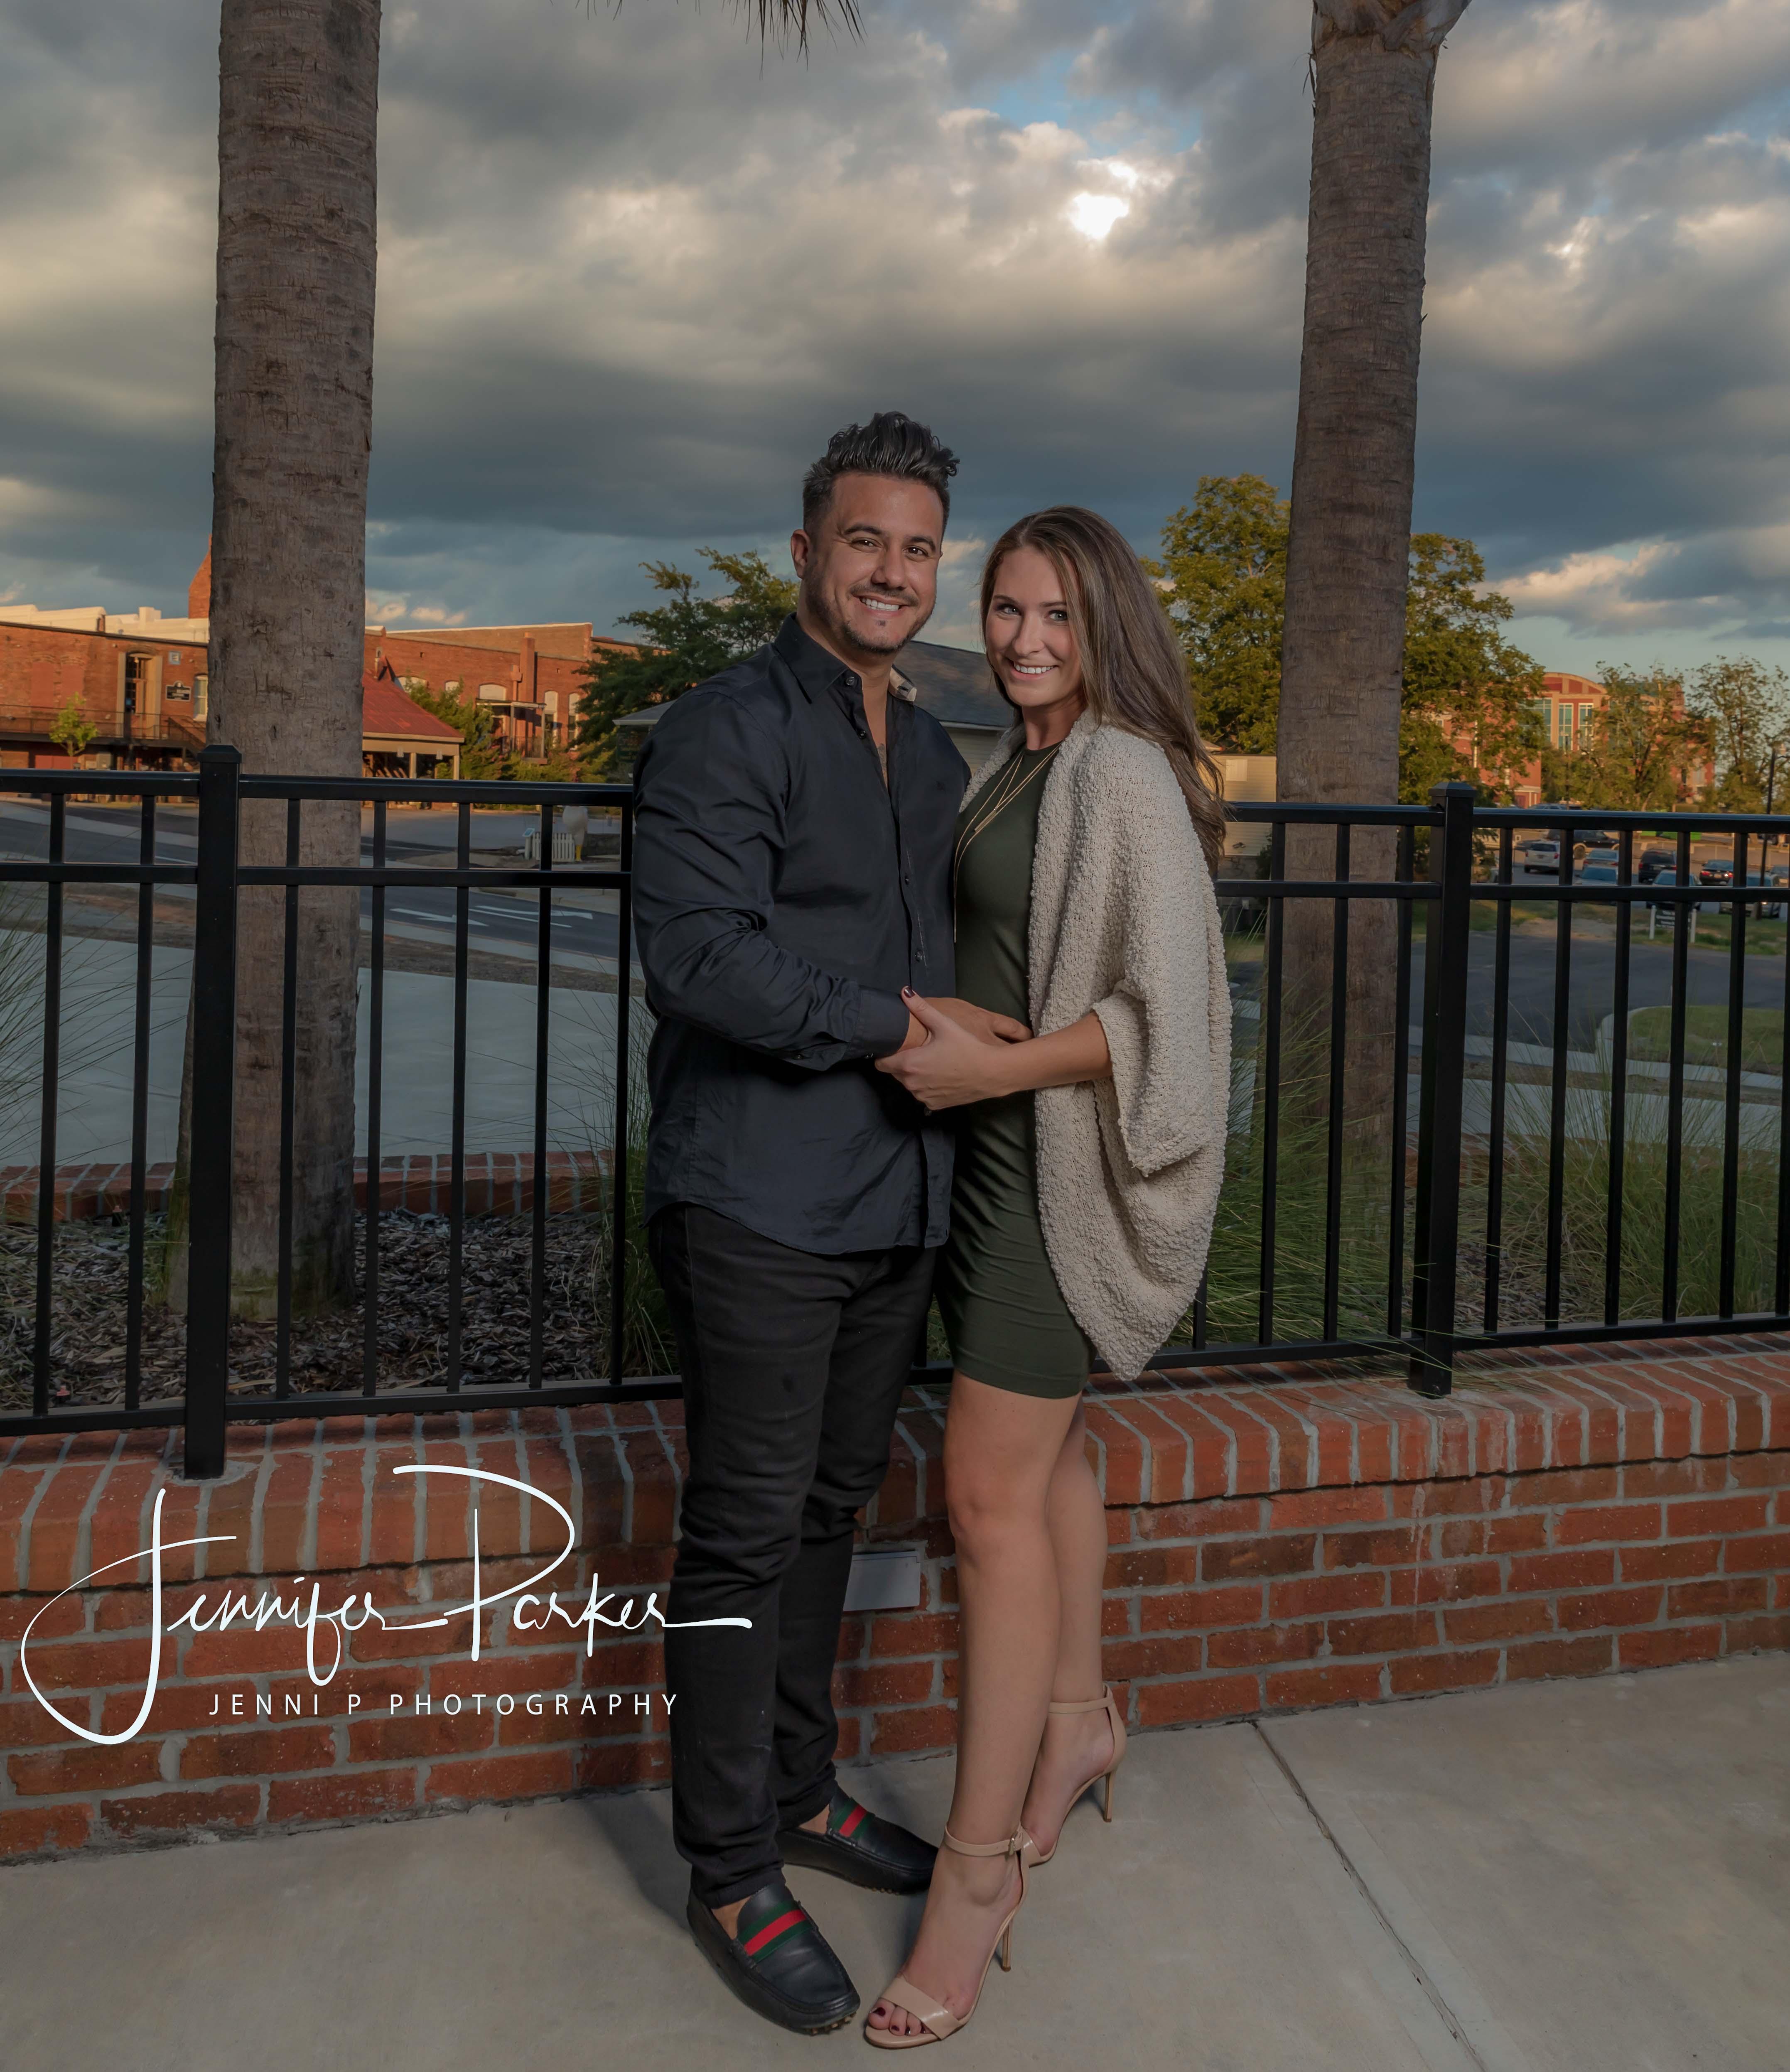 Jennipphotography.com-152